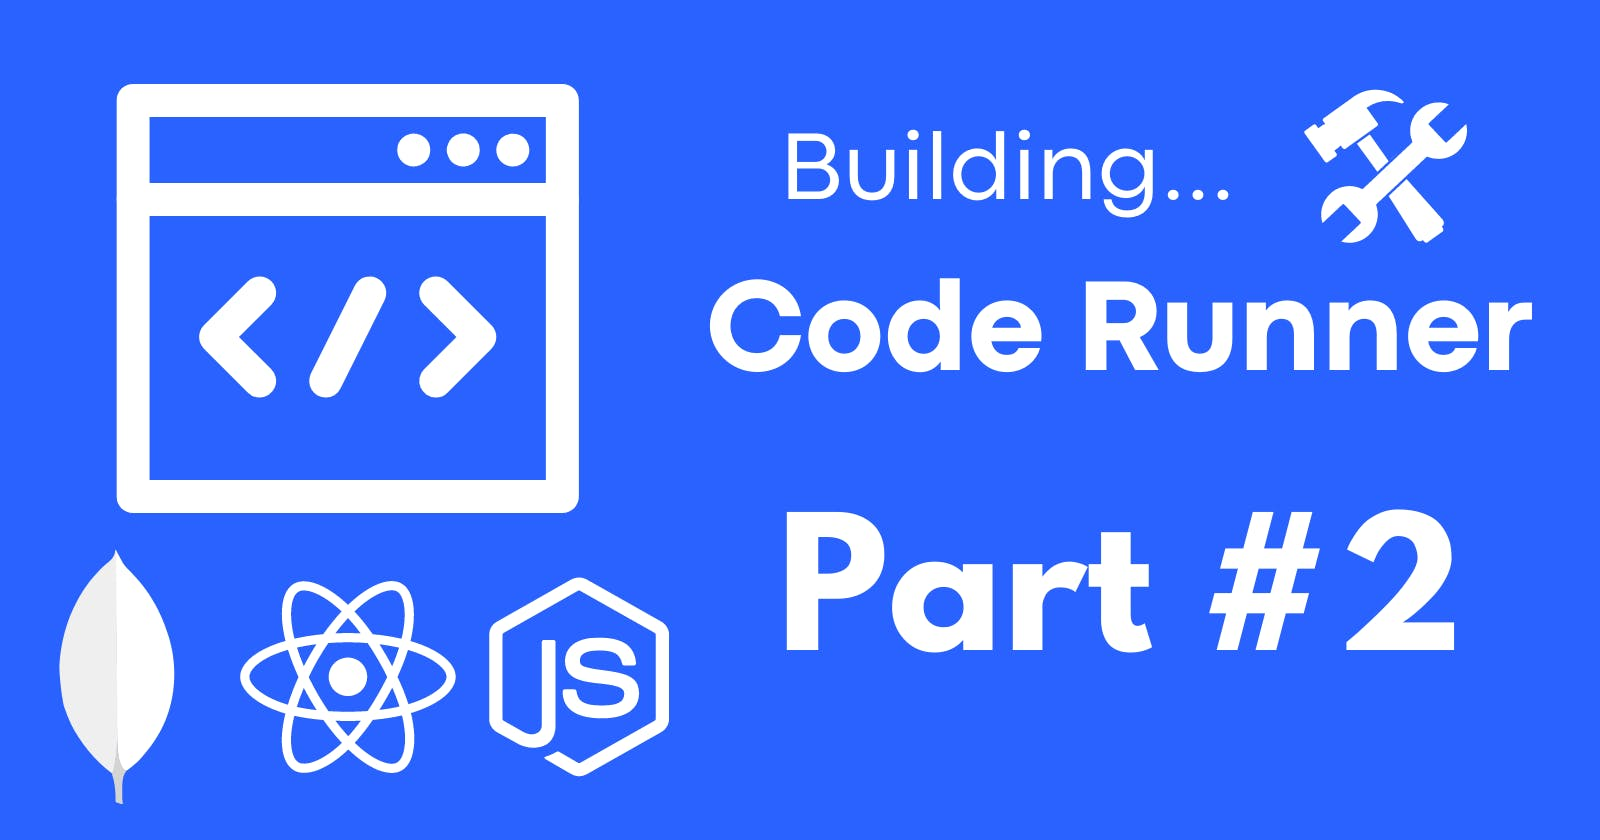 Building Code Runner - Part #2 : Node.js Backend With Express Server and JDoodle API